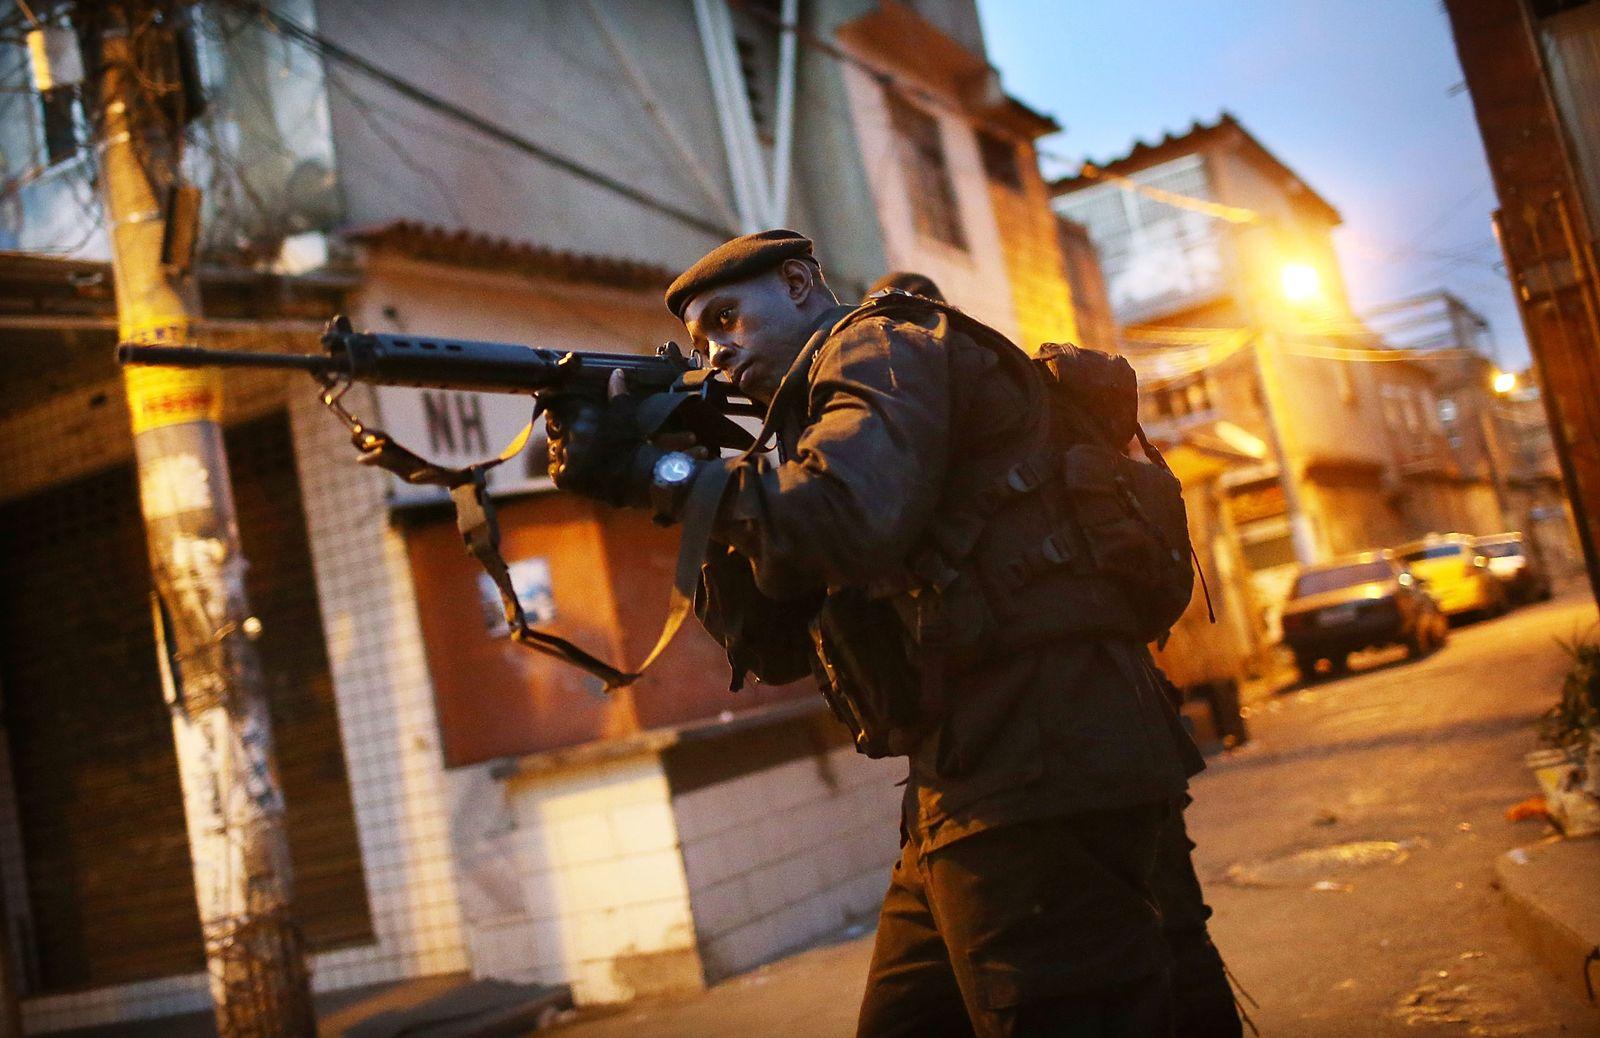 Brasilien/ Rio/ Elitesoldaten